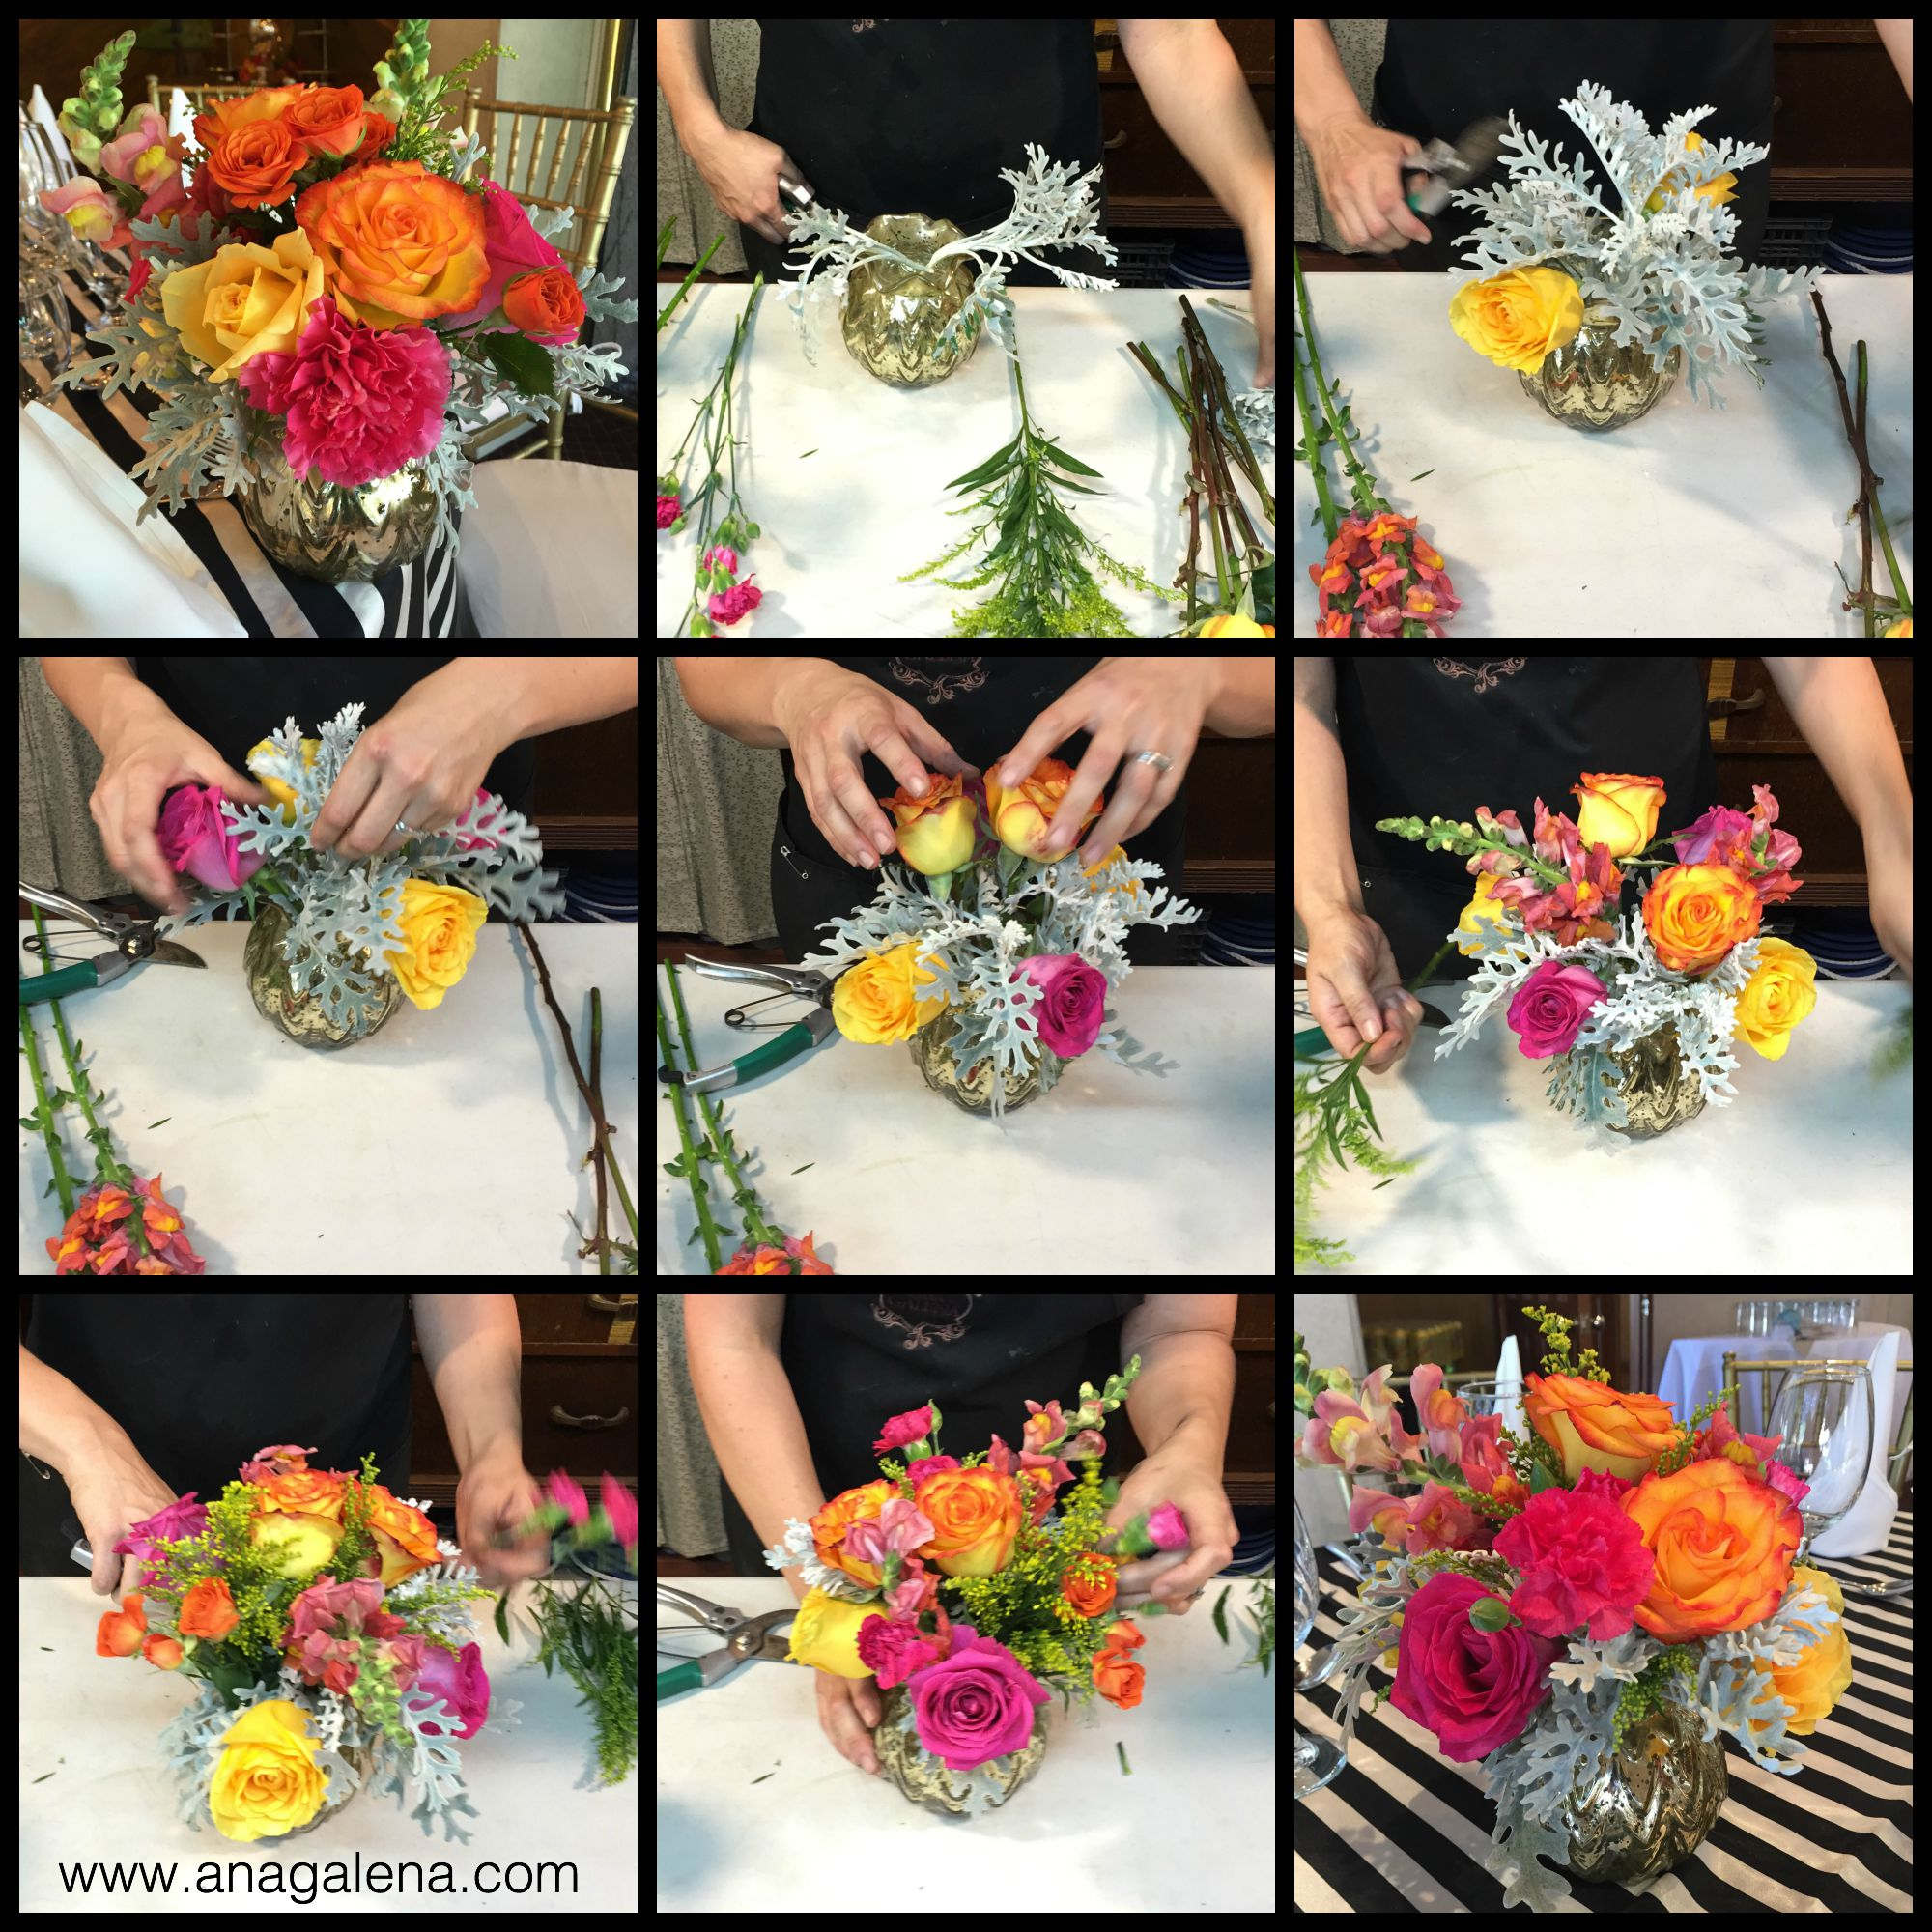 Centro de mesa colorido como escoger y combinar flores - Hacer un centro de flores ...